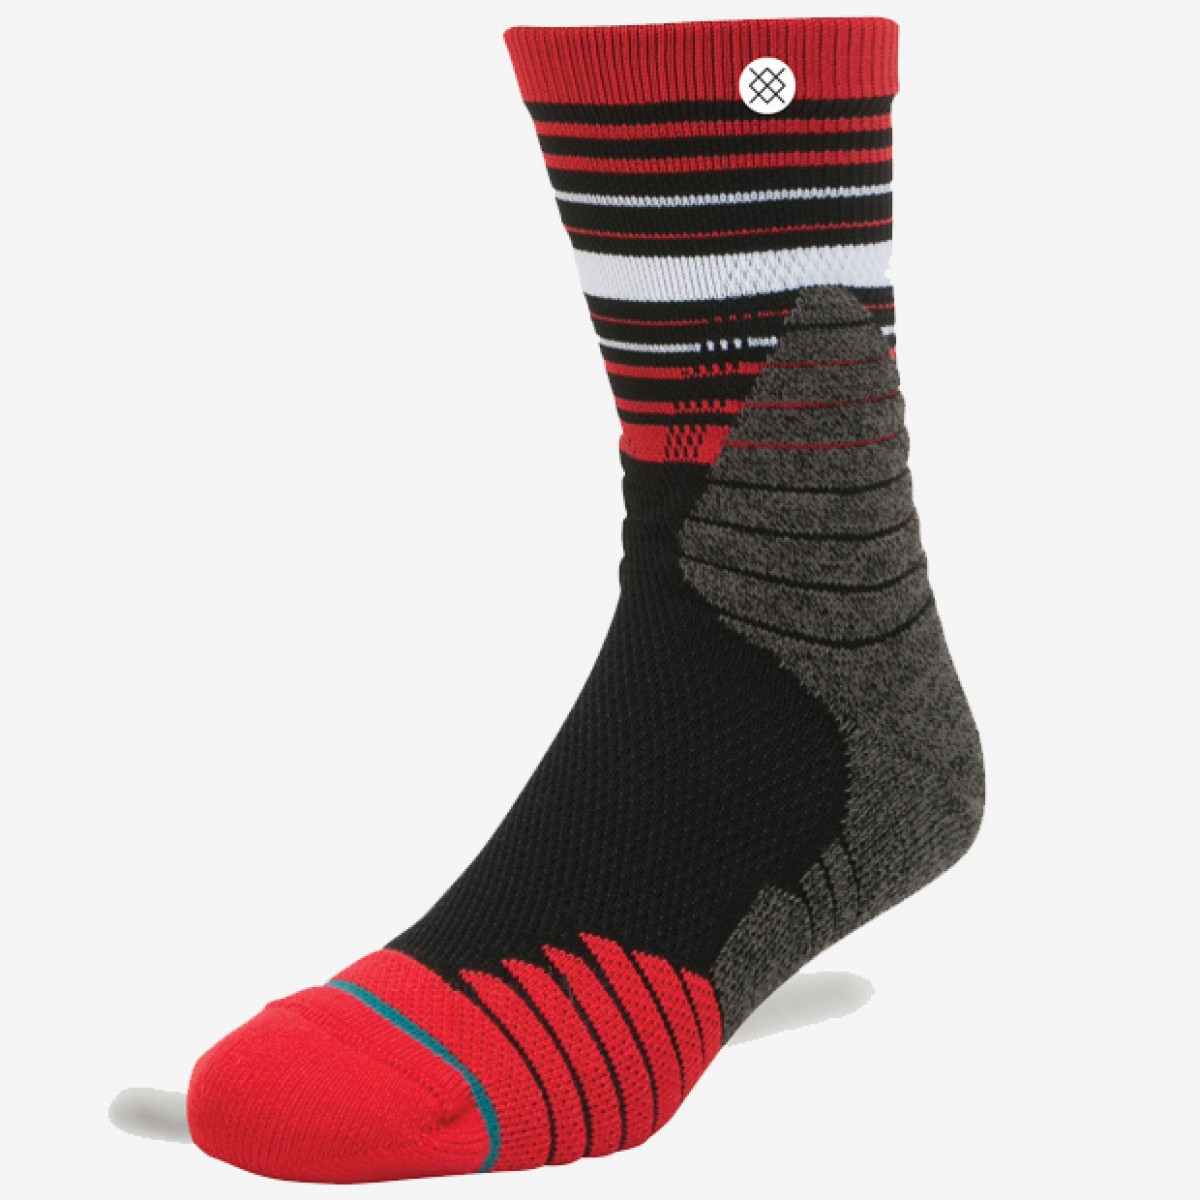 Stance Trey Socks 'Red'